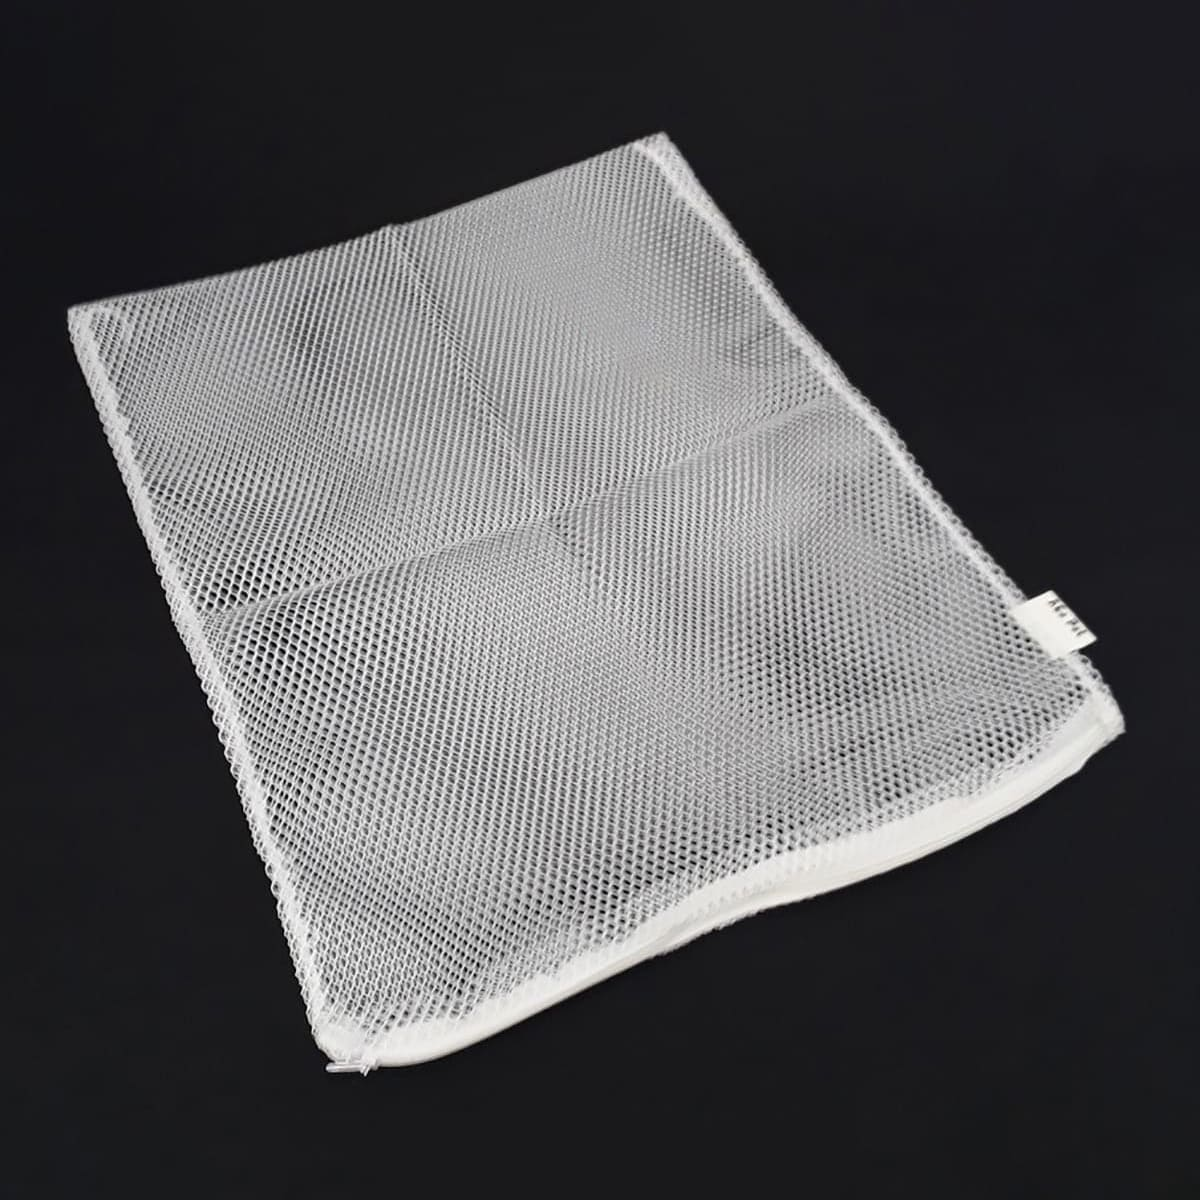 Bolsa para Material Filtrante N°7 WFish - 22X22 cm